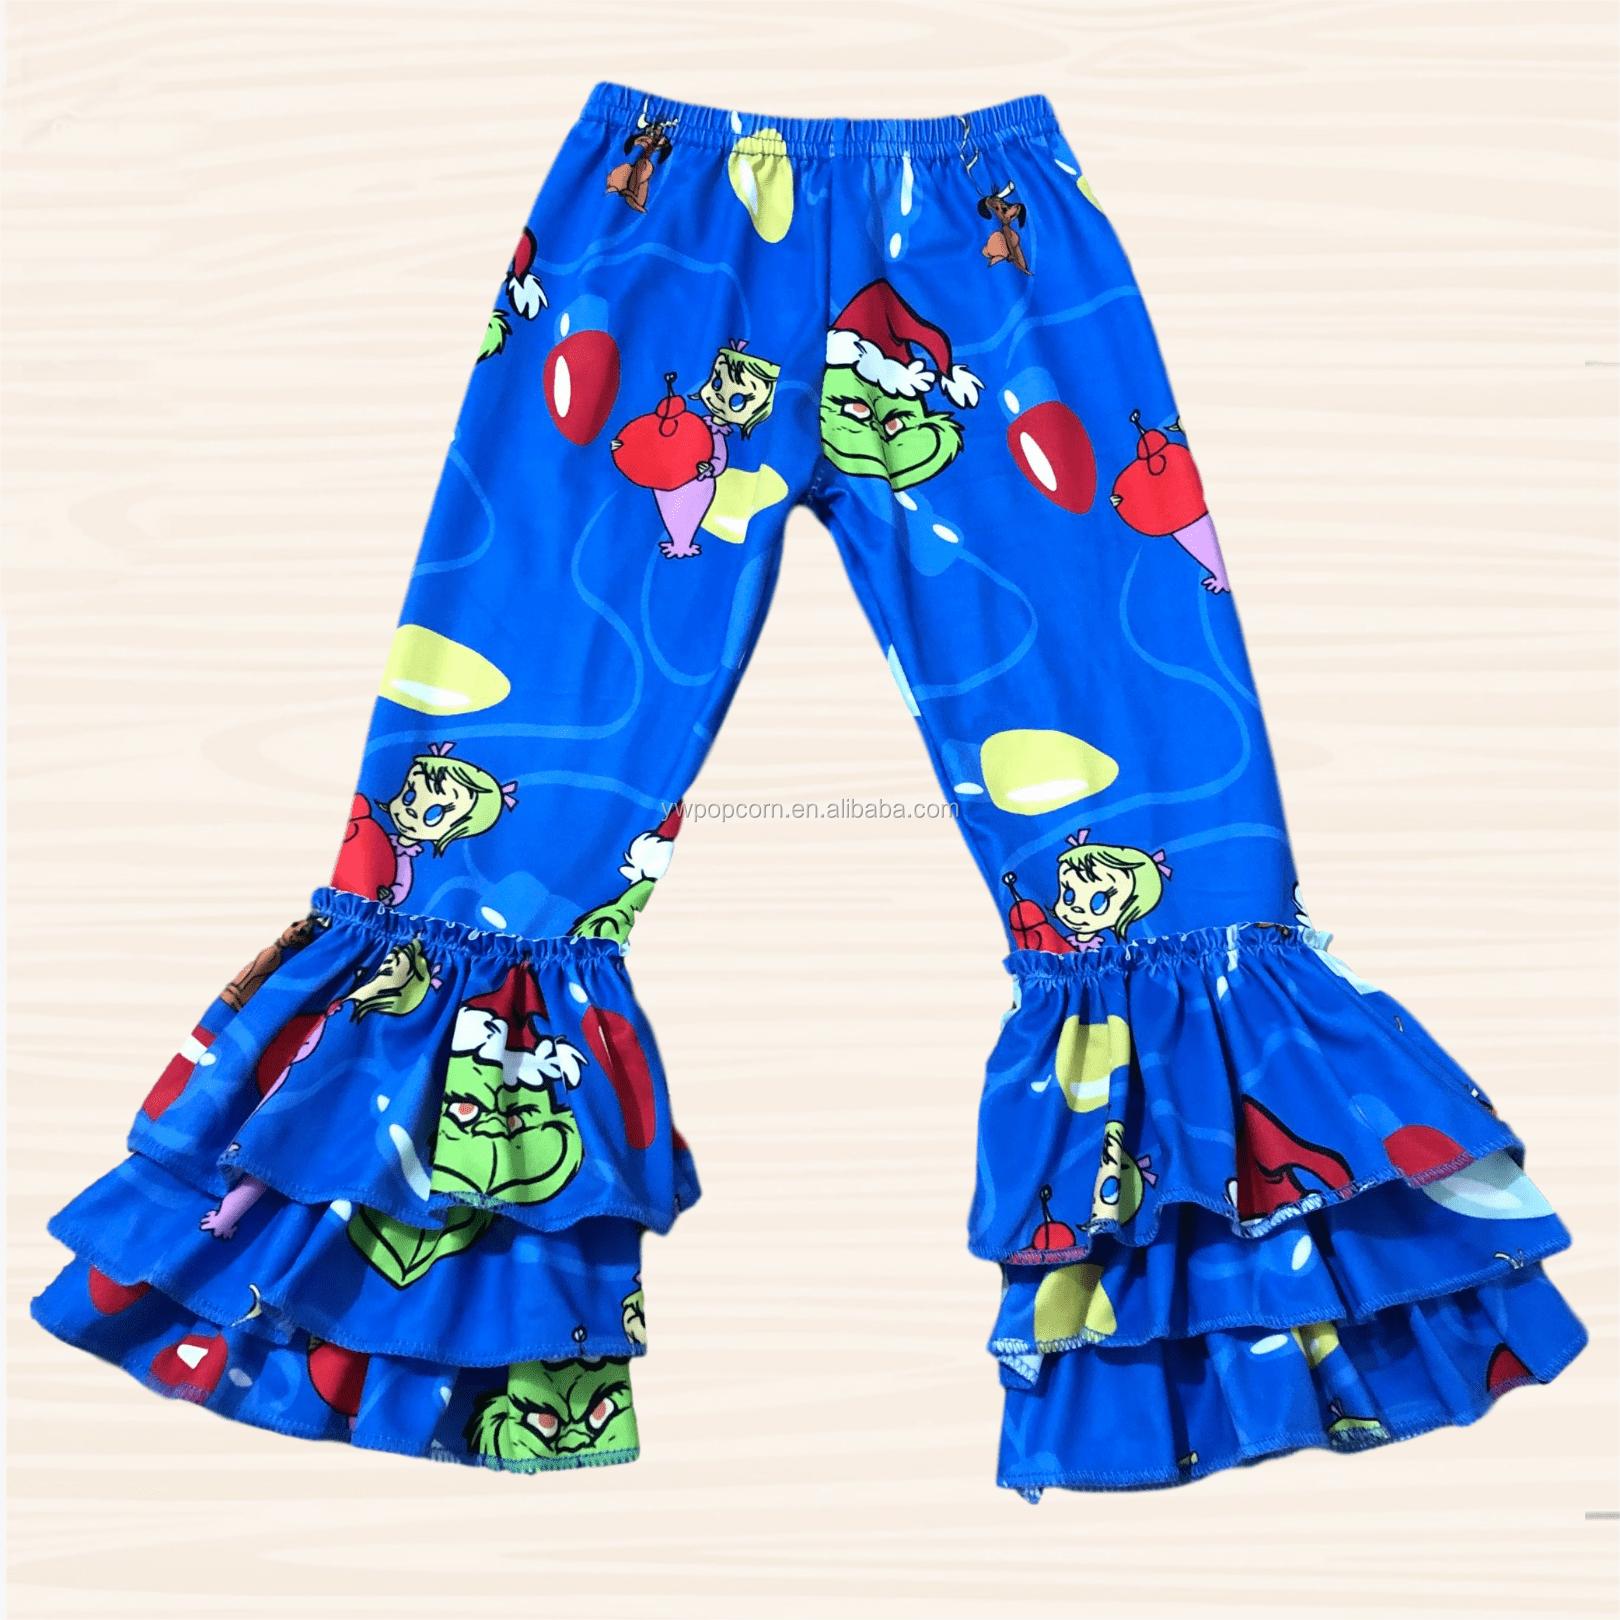 Baru Tiba Bayi Perempuan Legging Anak Celana Legging Natal Cetak Mewah Anak Celana Grosir Buy Legging Anak Kustom Legging Anak Anak Celana Product On Alibaba Com